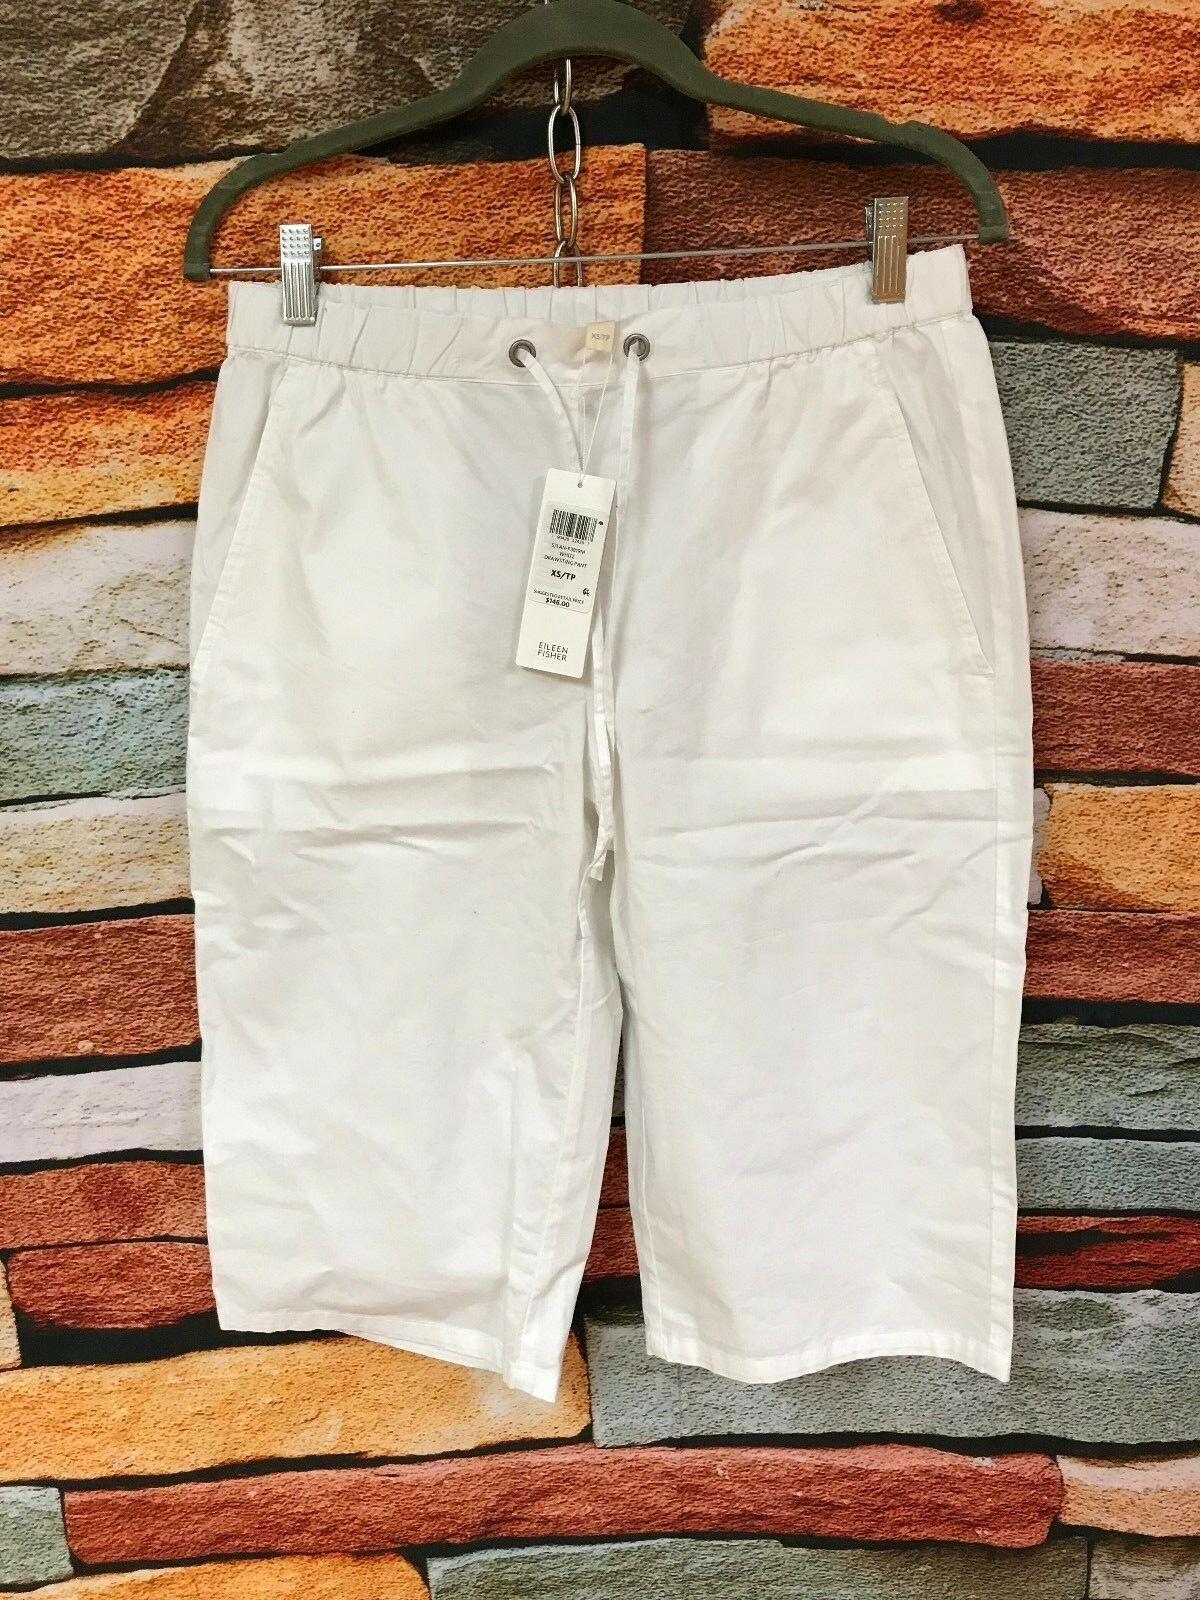 148 NWT EILEEN FISHER WHITE COTTON STRETCH POPLIN DRAWSTRING SHORTS PANTS XS